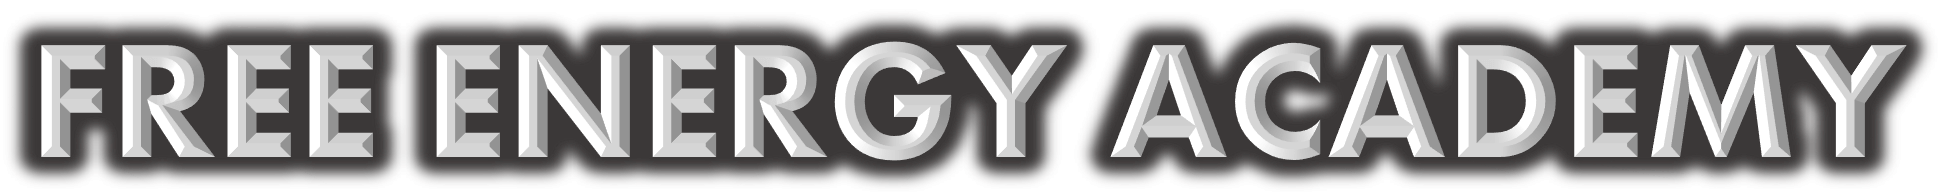 Free Energy Academy